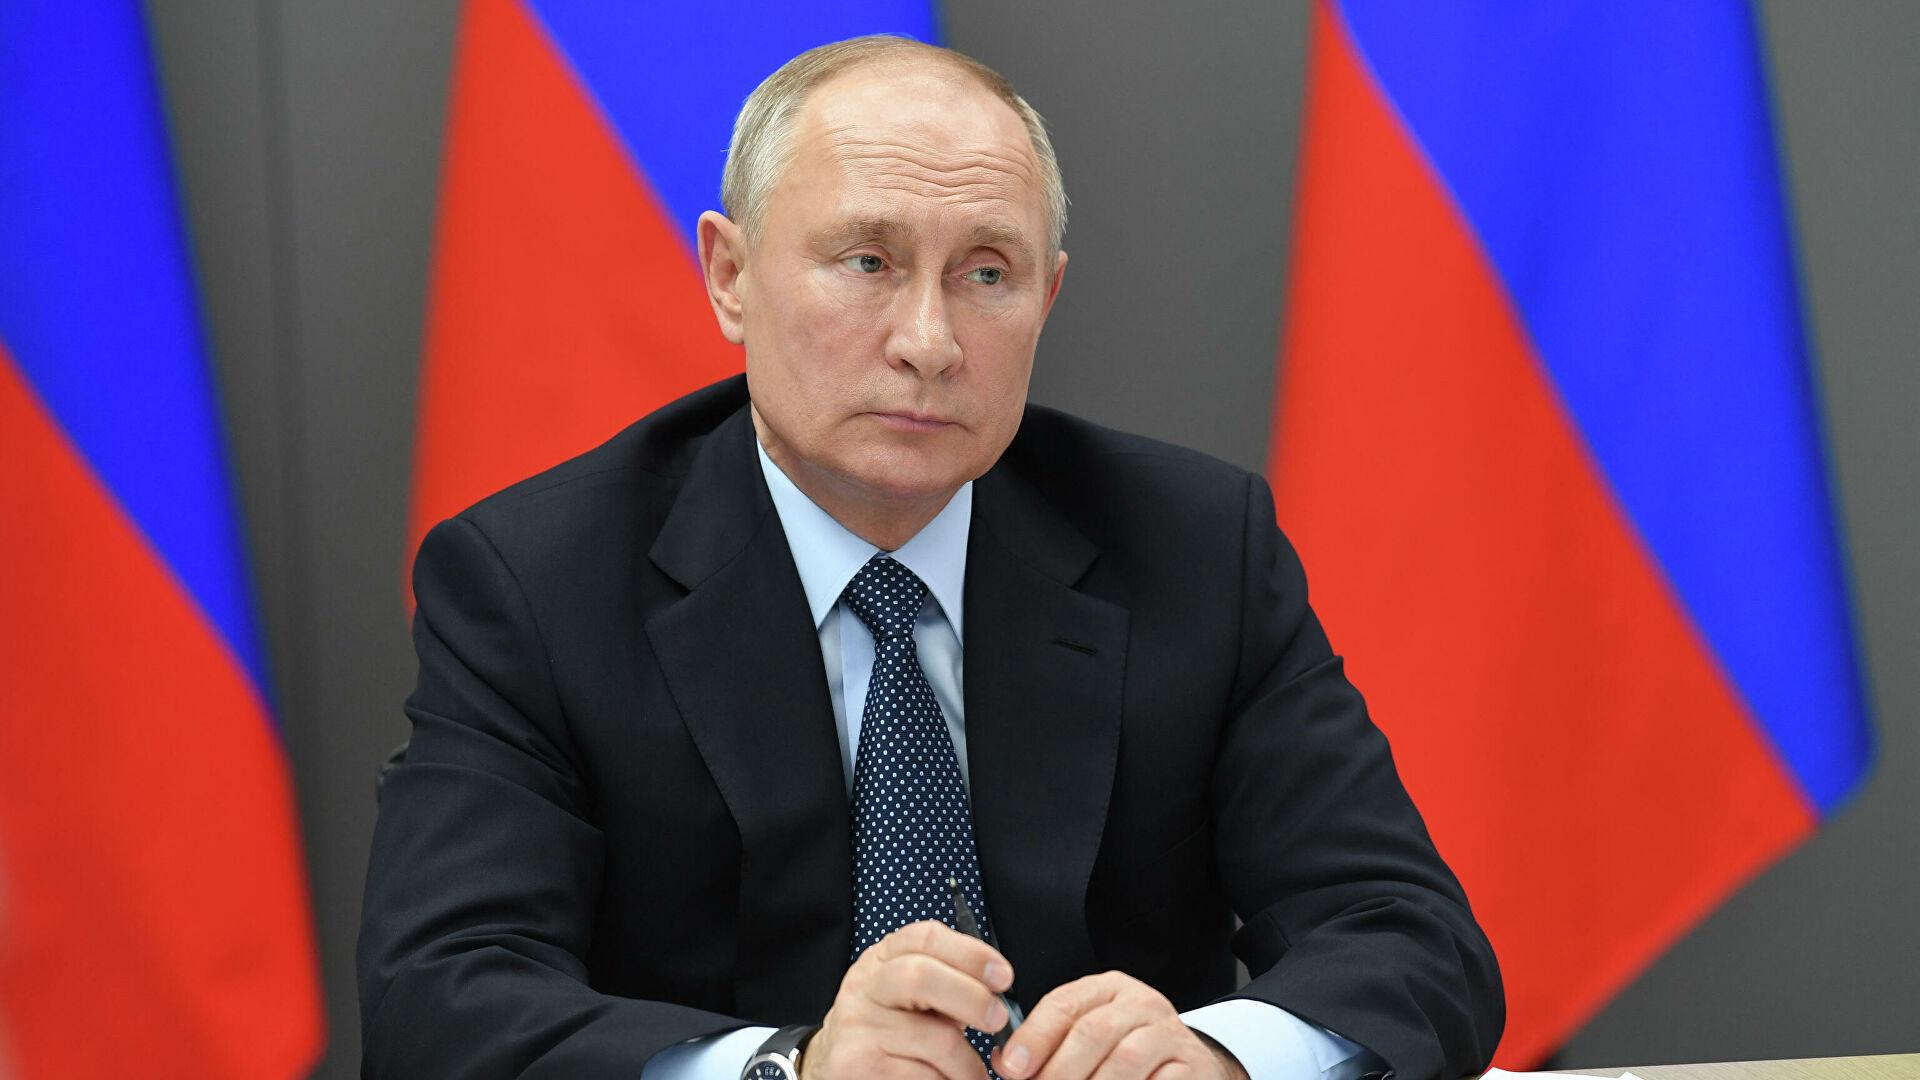 Путин позвао да се морални и етички стандарди прошире на интернет